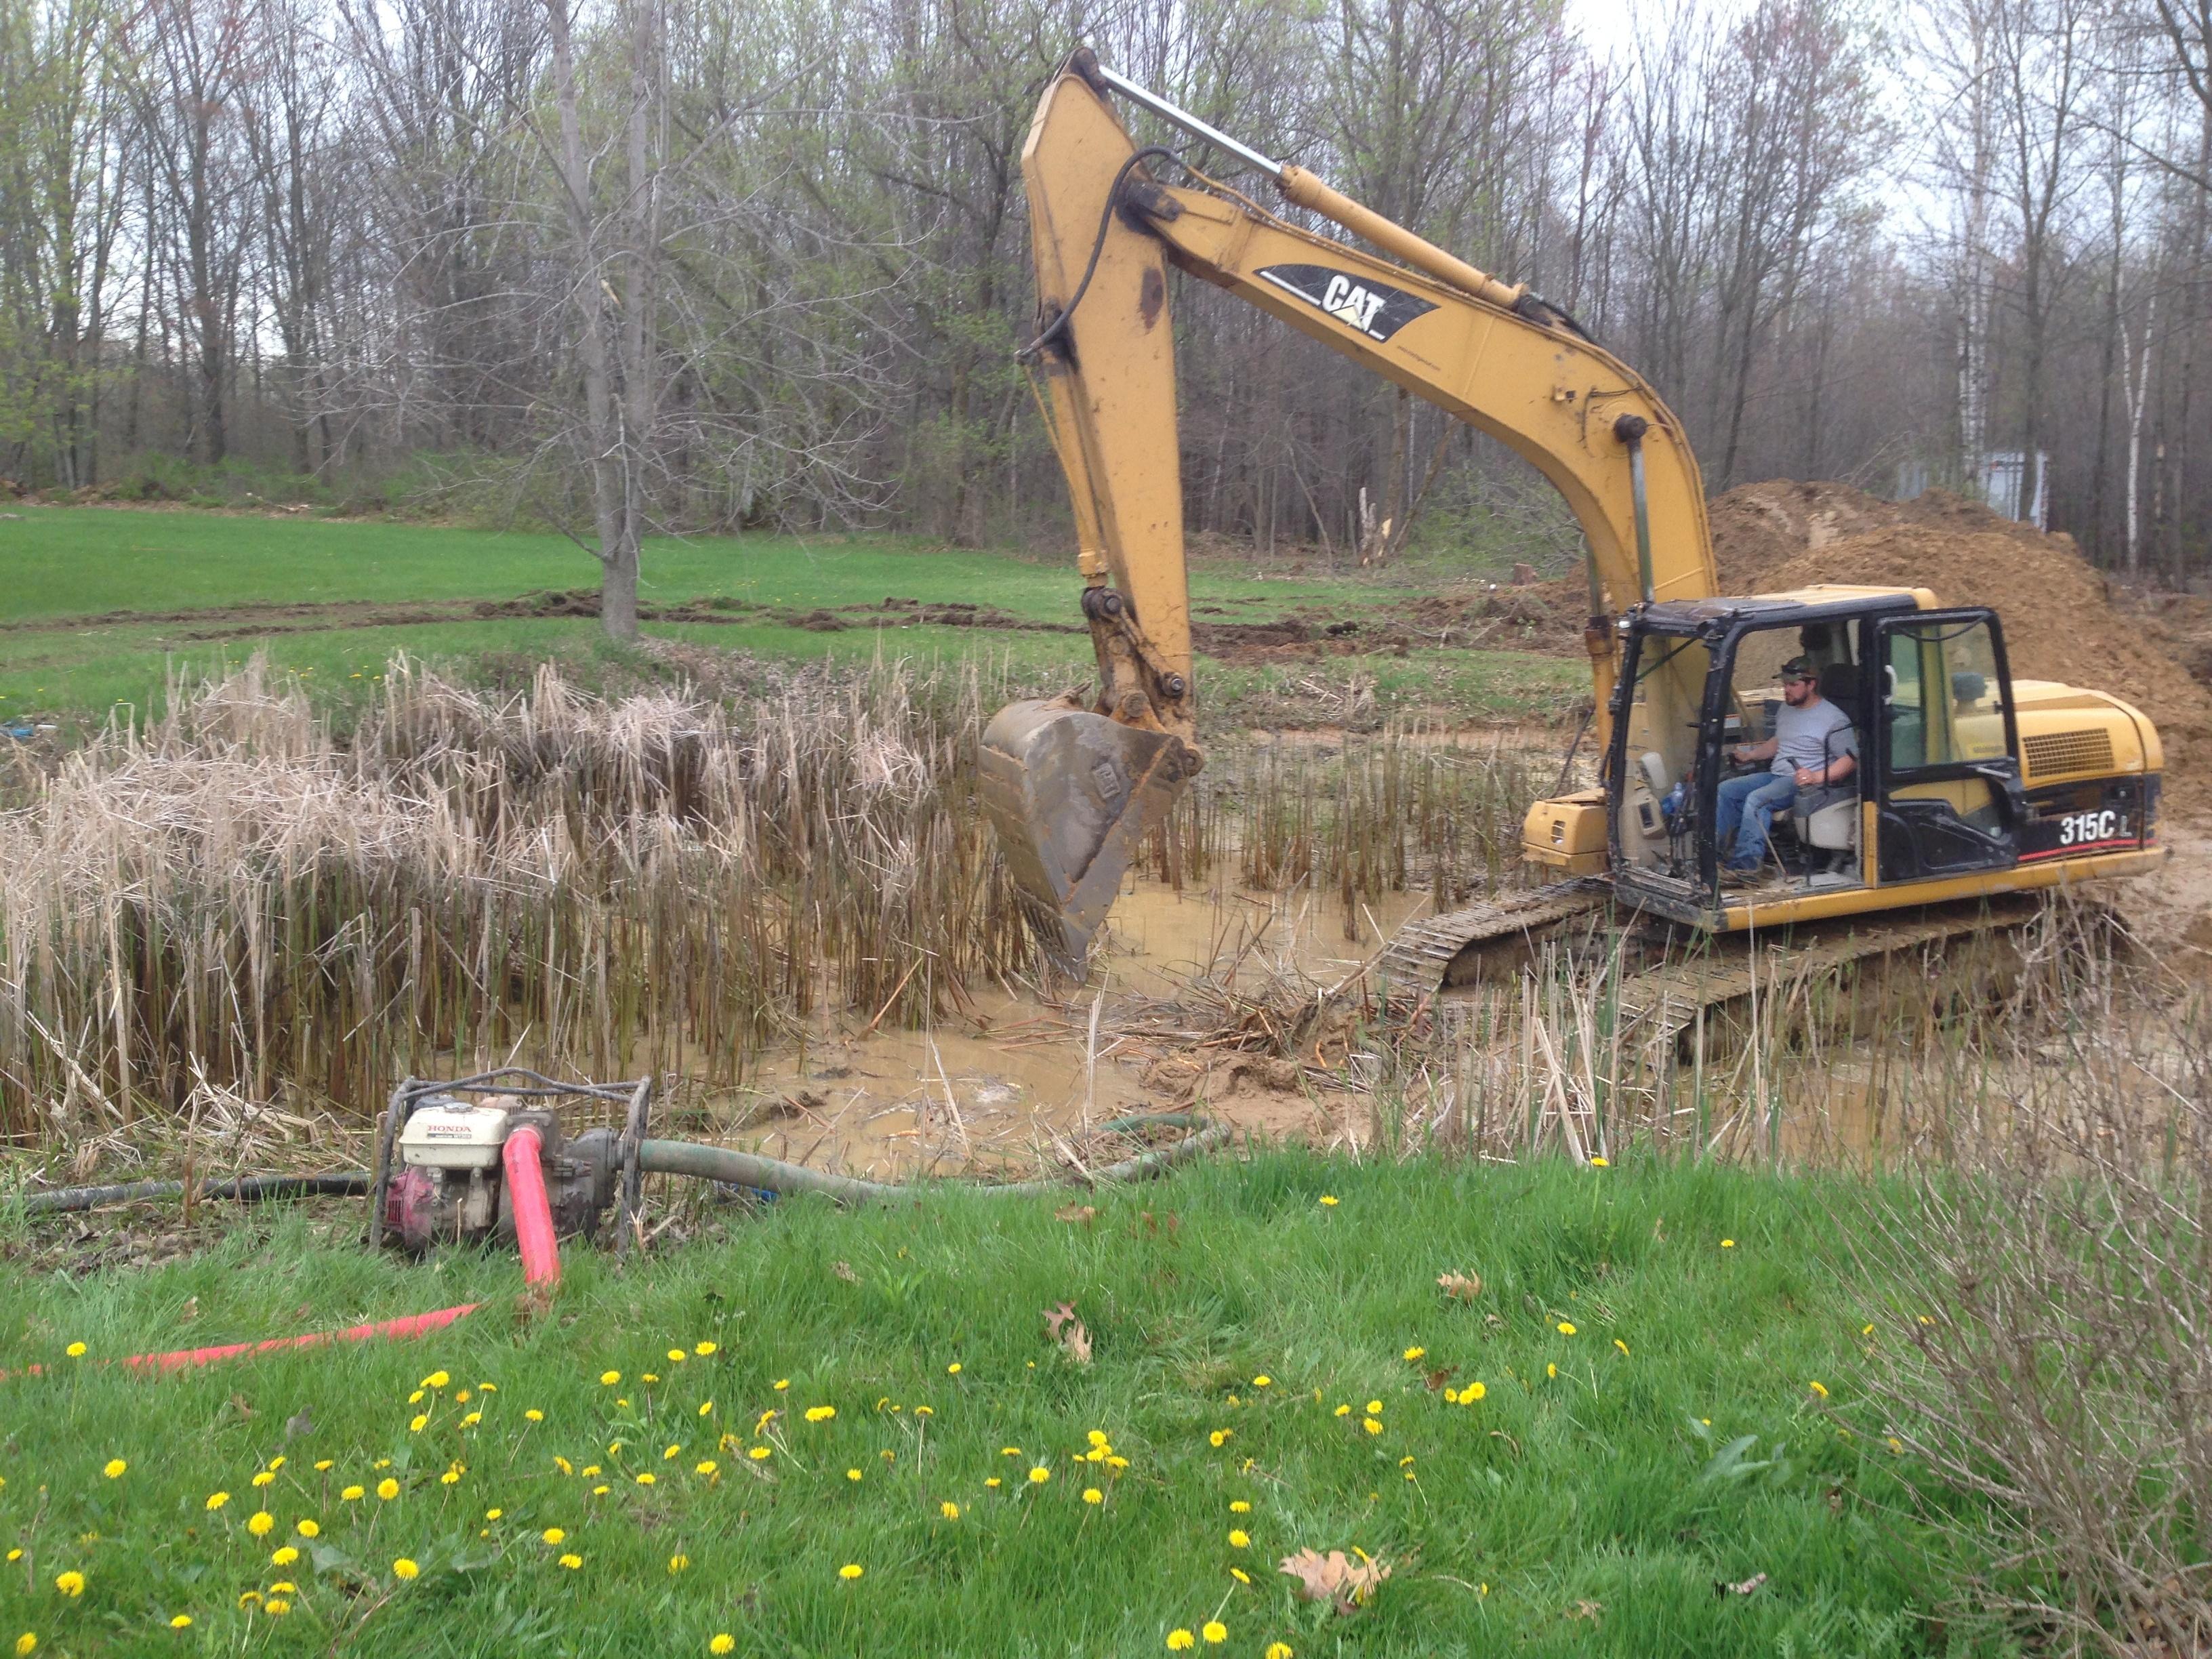 Pond_expansion_Michigan_Genesee_County_MI_____________________15.jpg